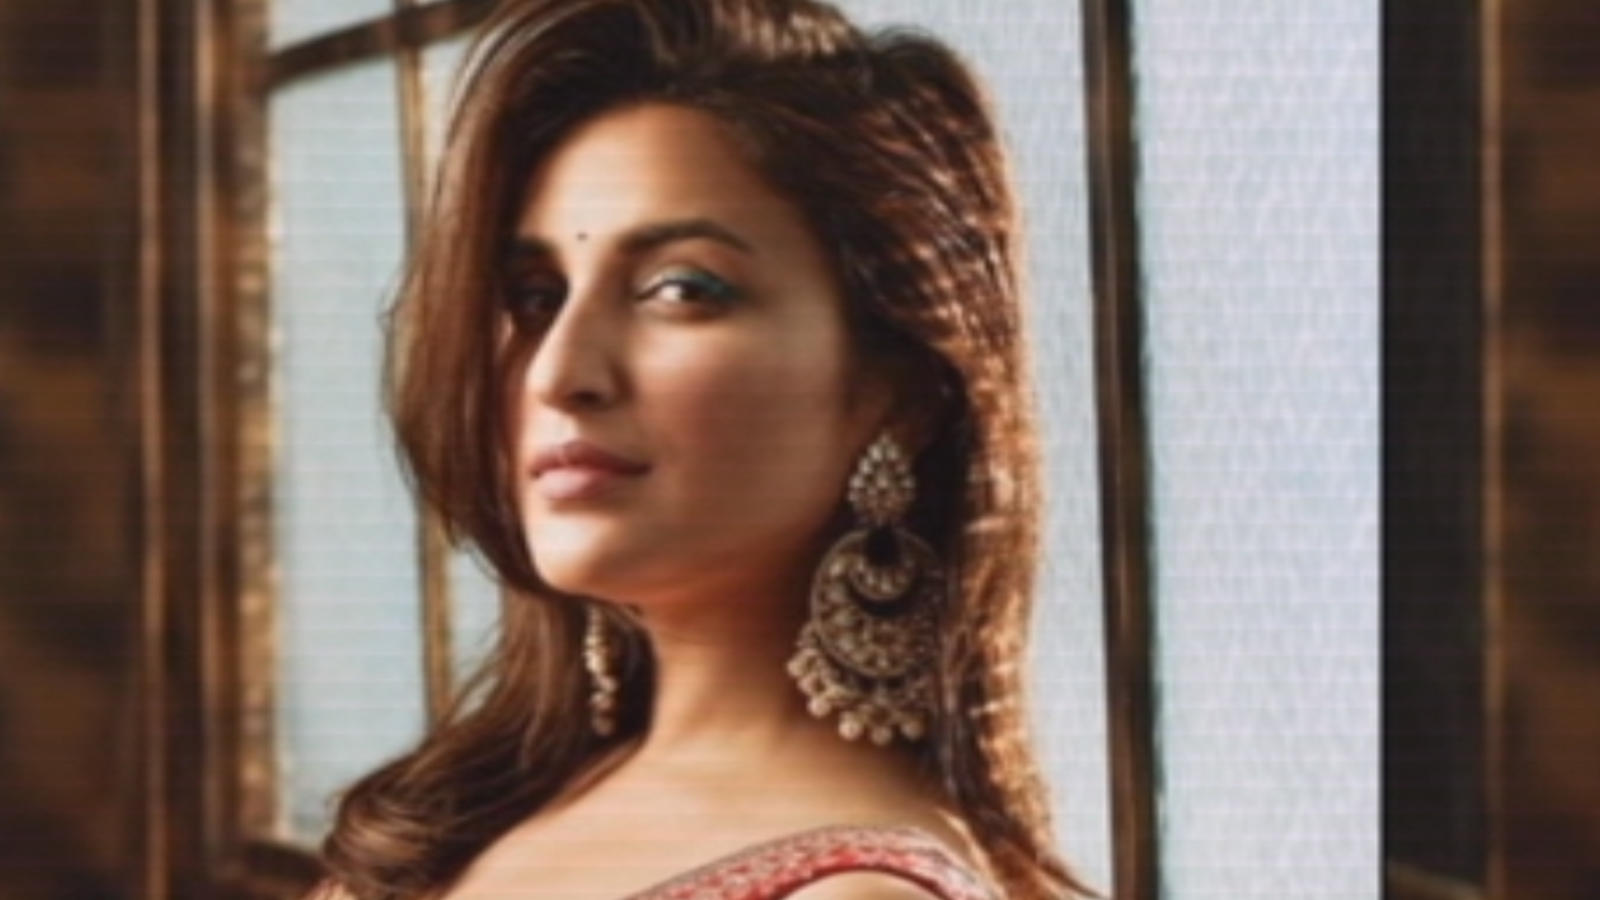 Movie preps, shifting her house: Parineeti Chopra's jam-packed schedule